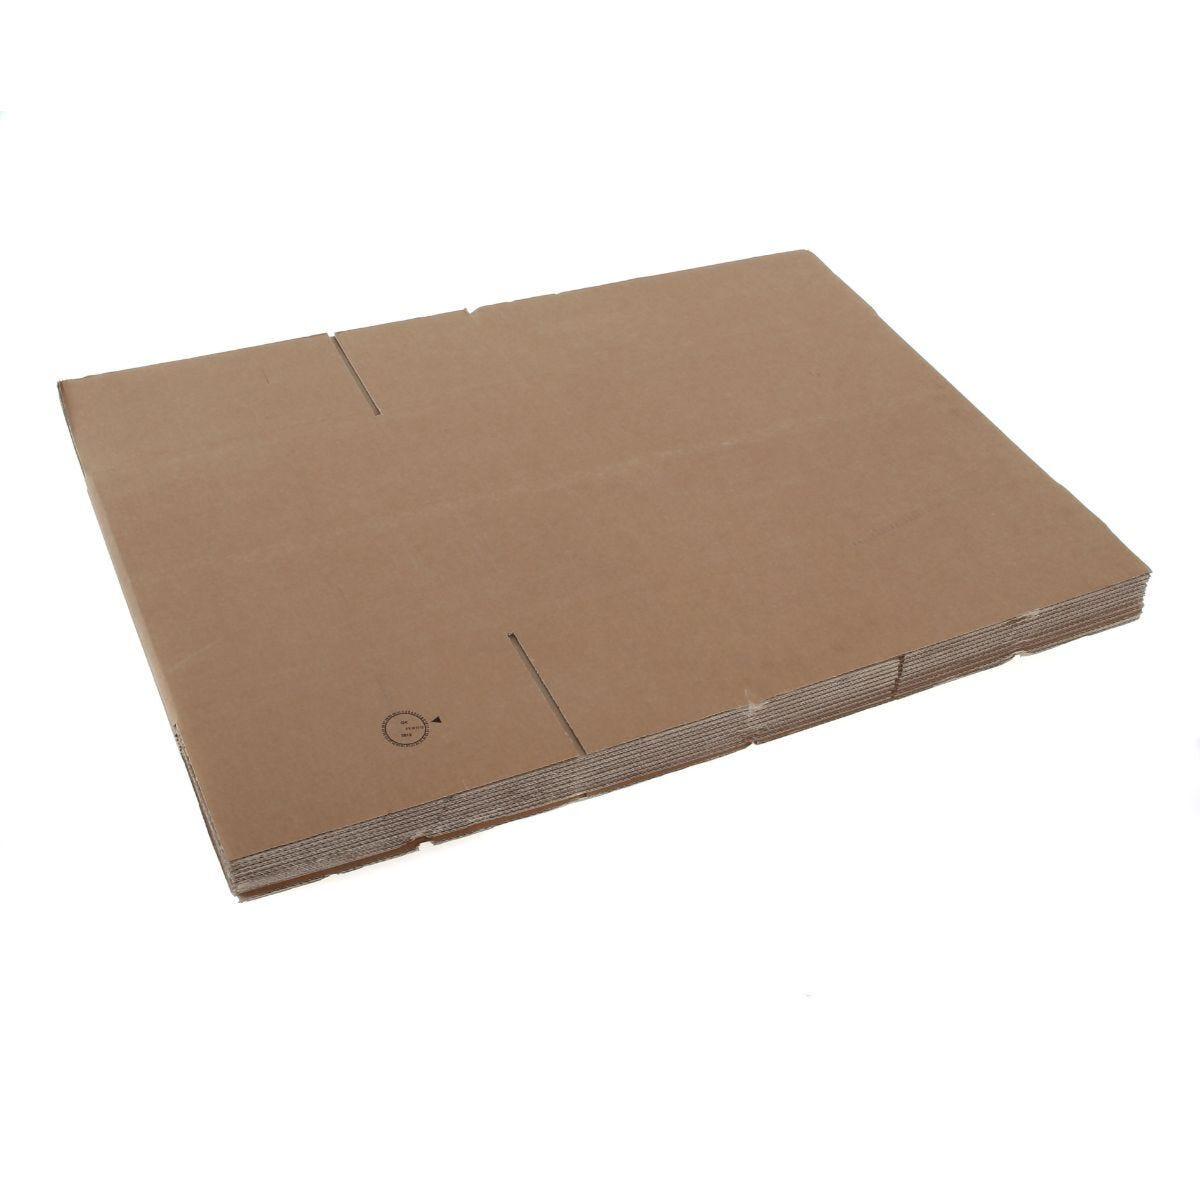 Posting Single Walled Cardboard Carton Box 635x305x330mm Pack of 10